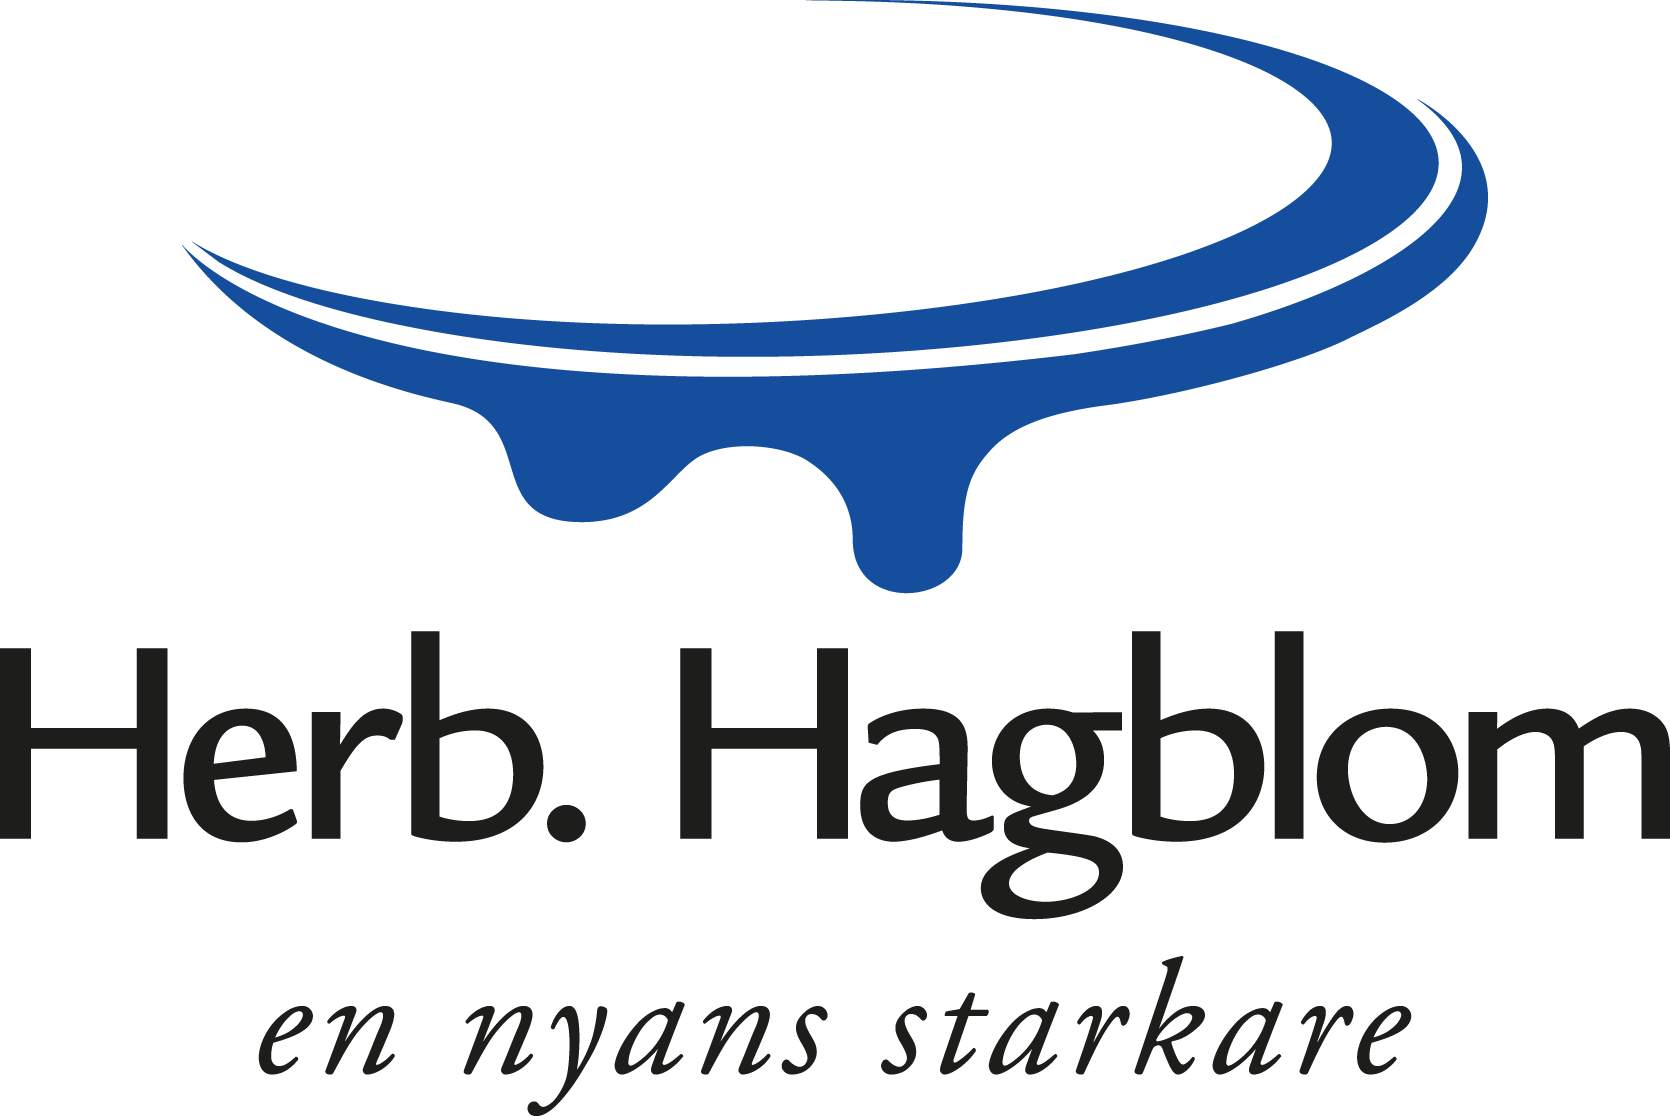 HERB Hagblom